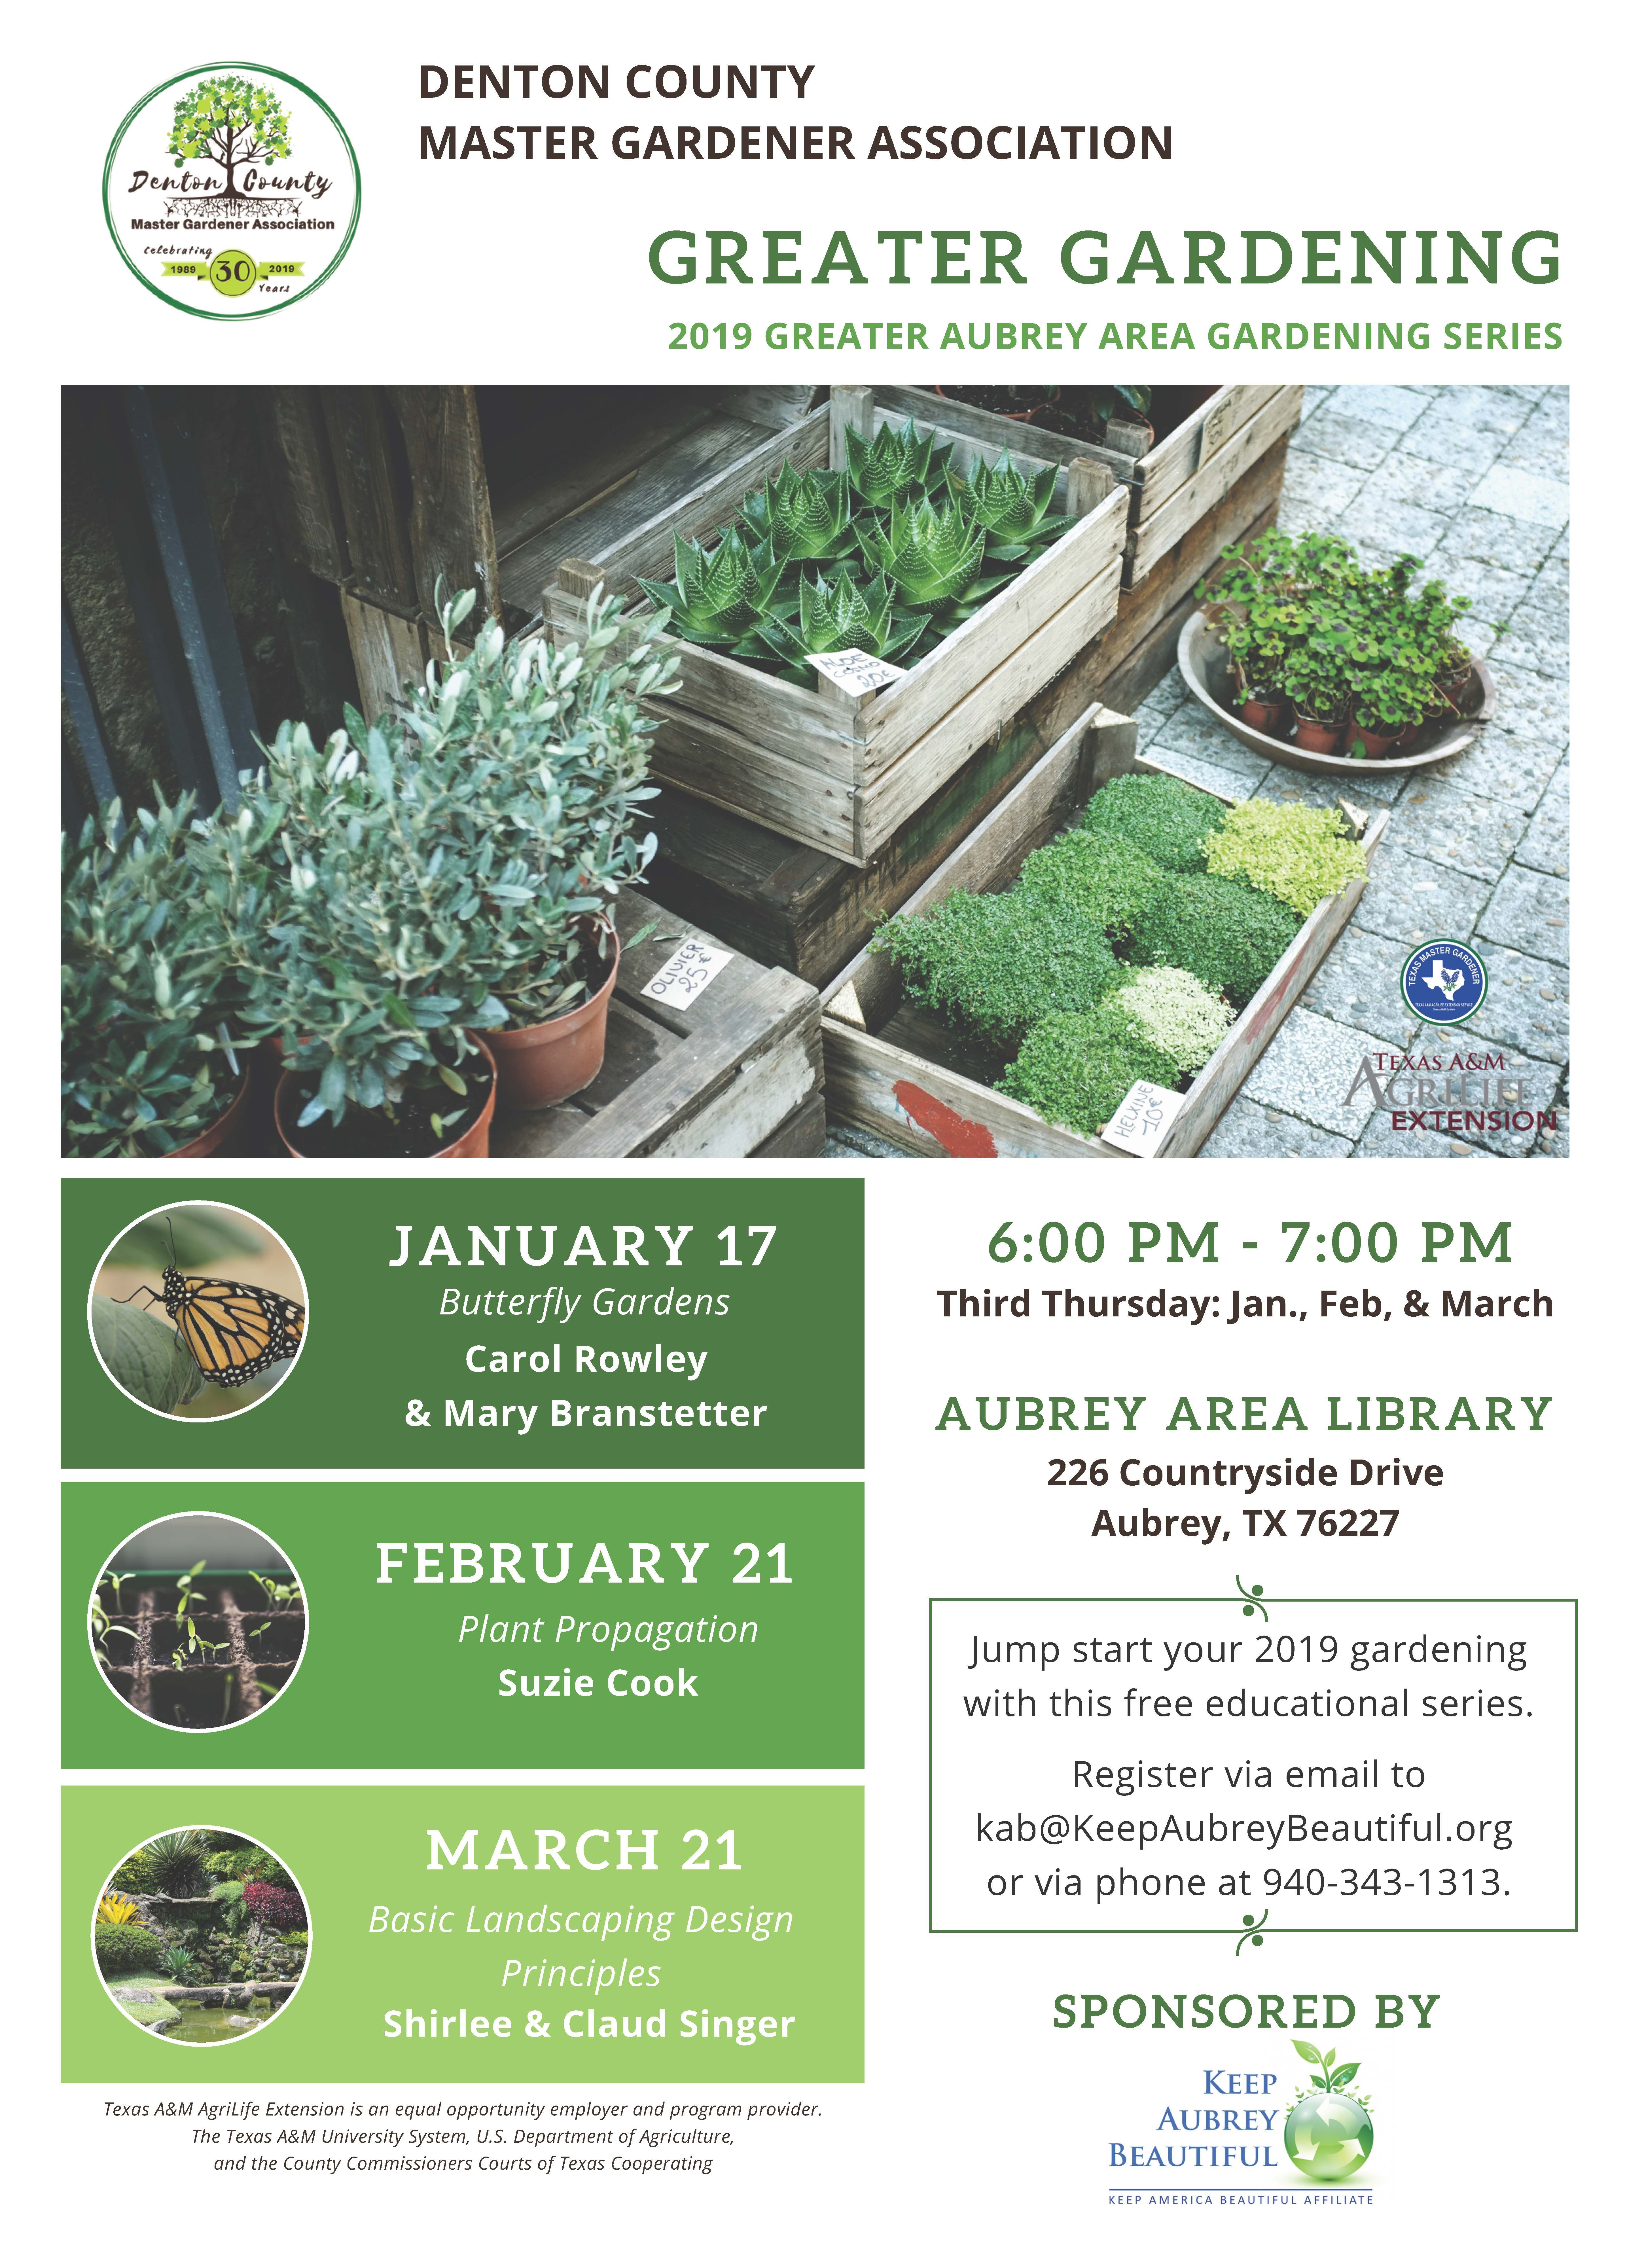 932f8a78f71015535926d7820e5aabe0 - Texas Organic Farmers And Gardeners Association